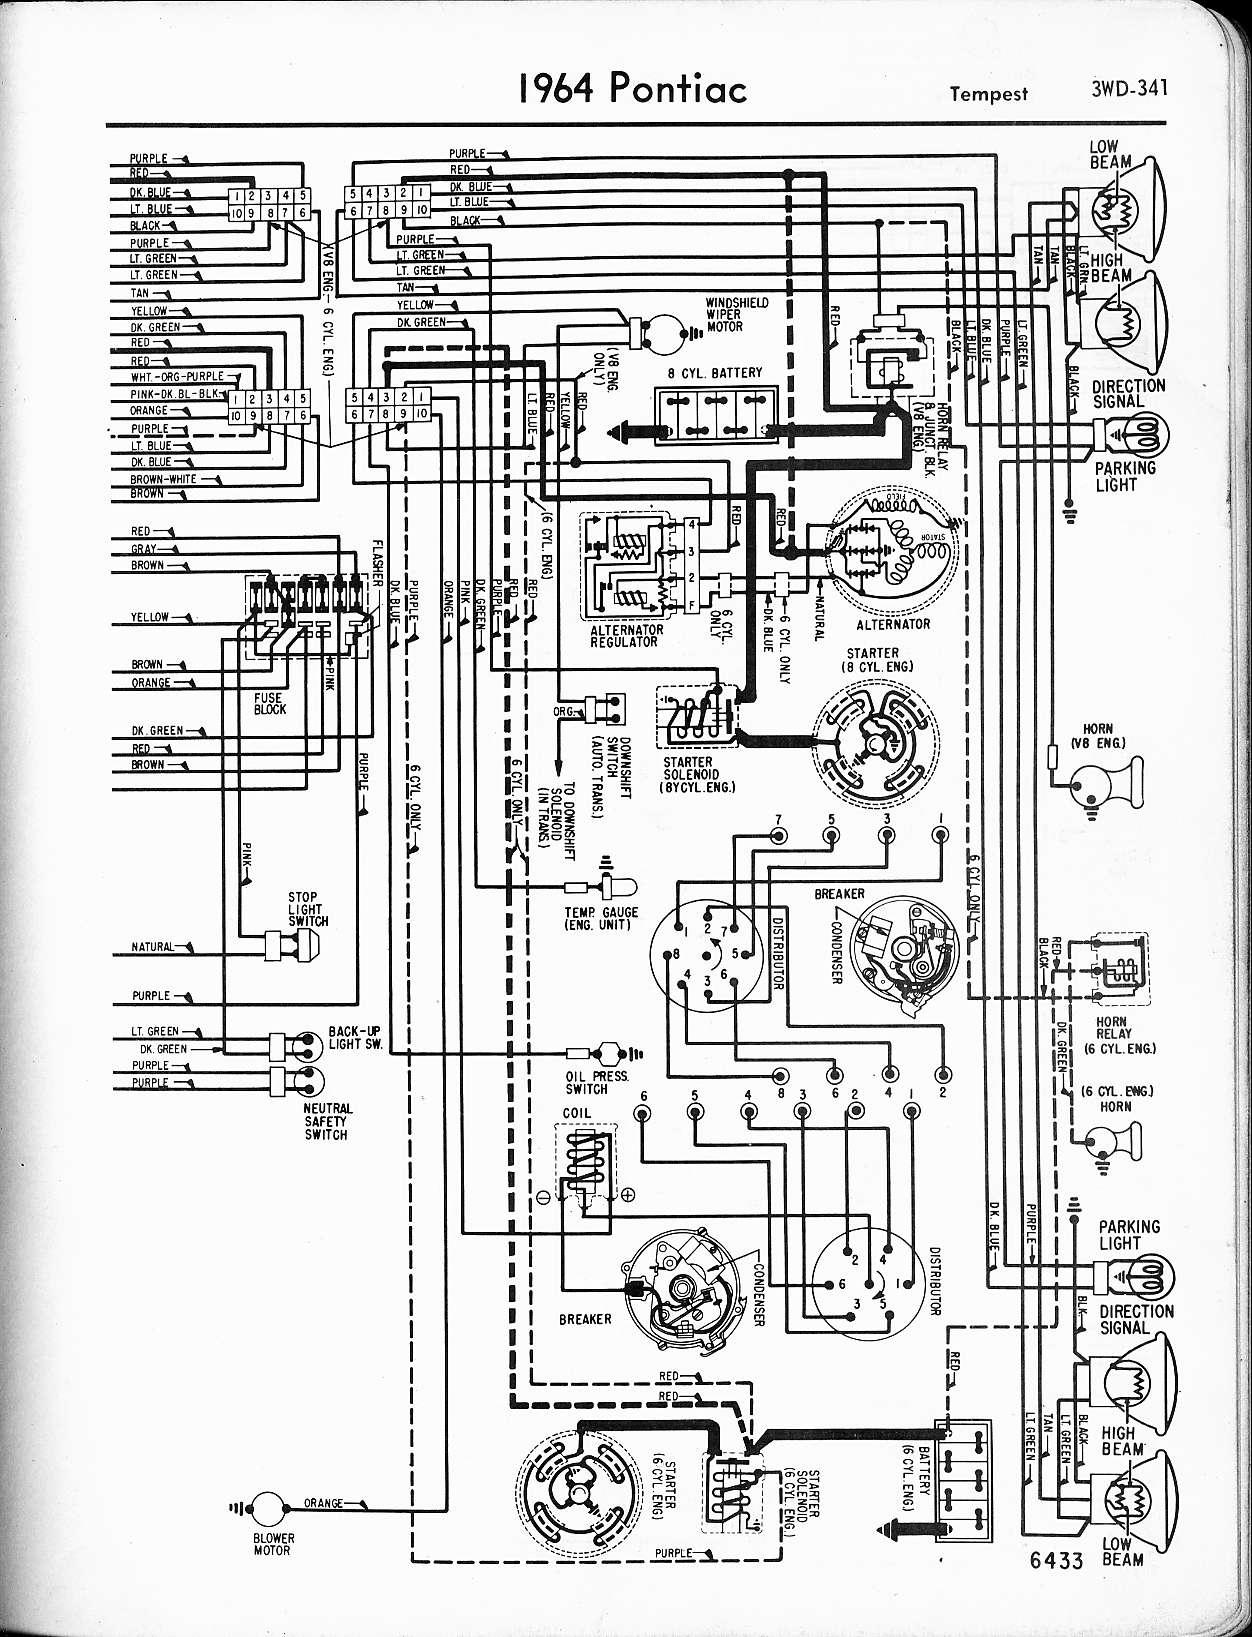 1963 Pontiac Catalina Wiring Diagram 1963 Ford Galaxie 500